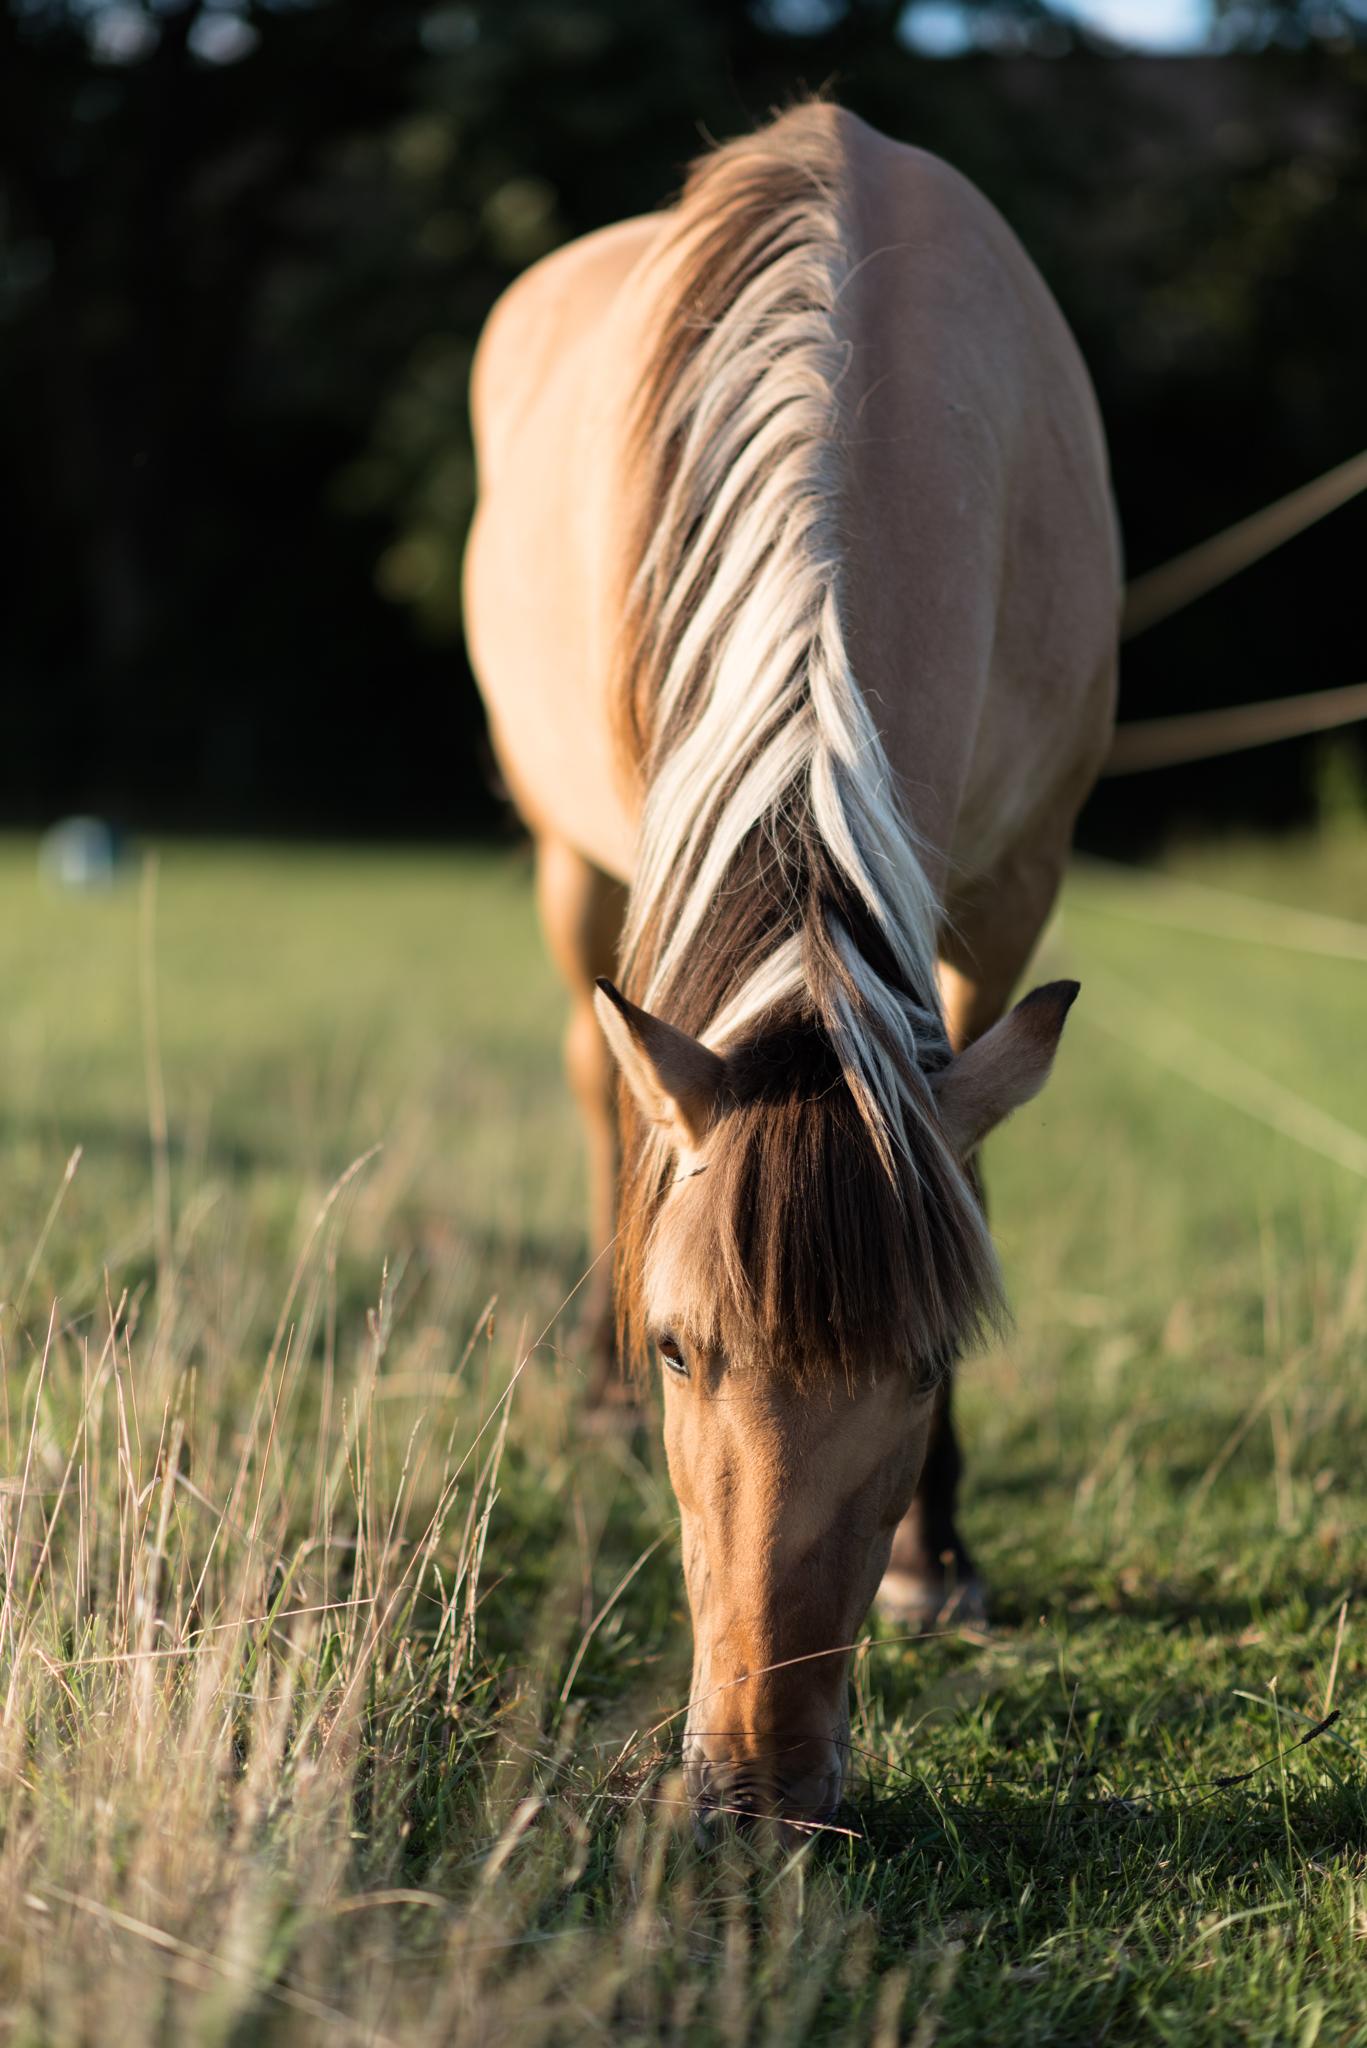 015_Horse_2016-08.jpg